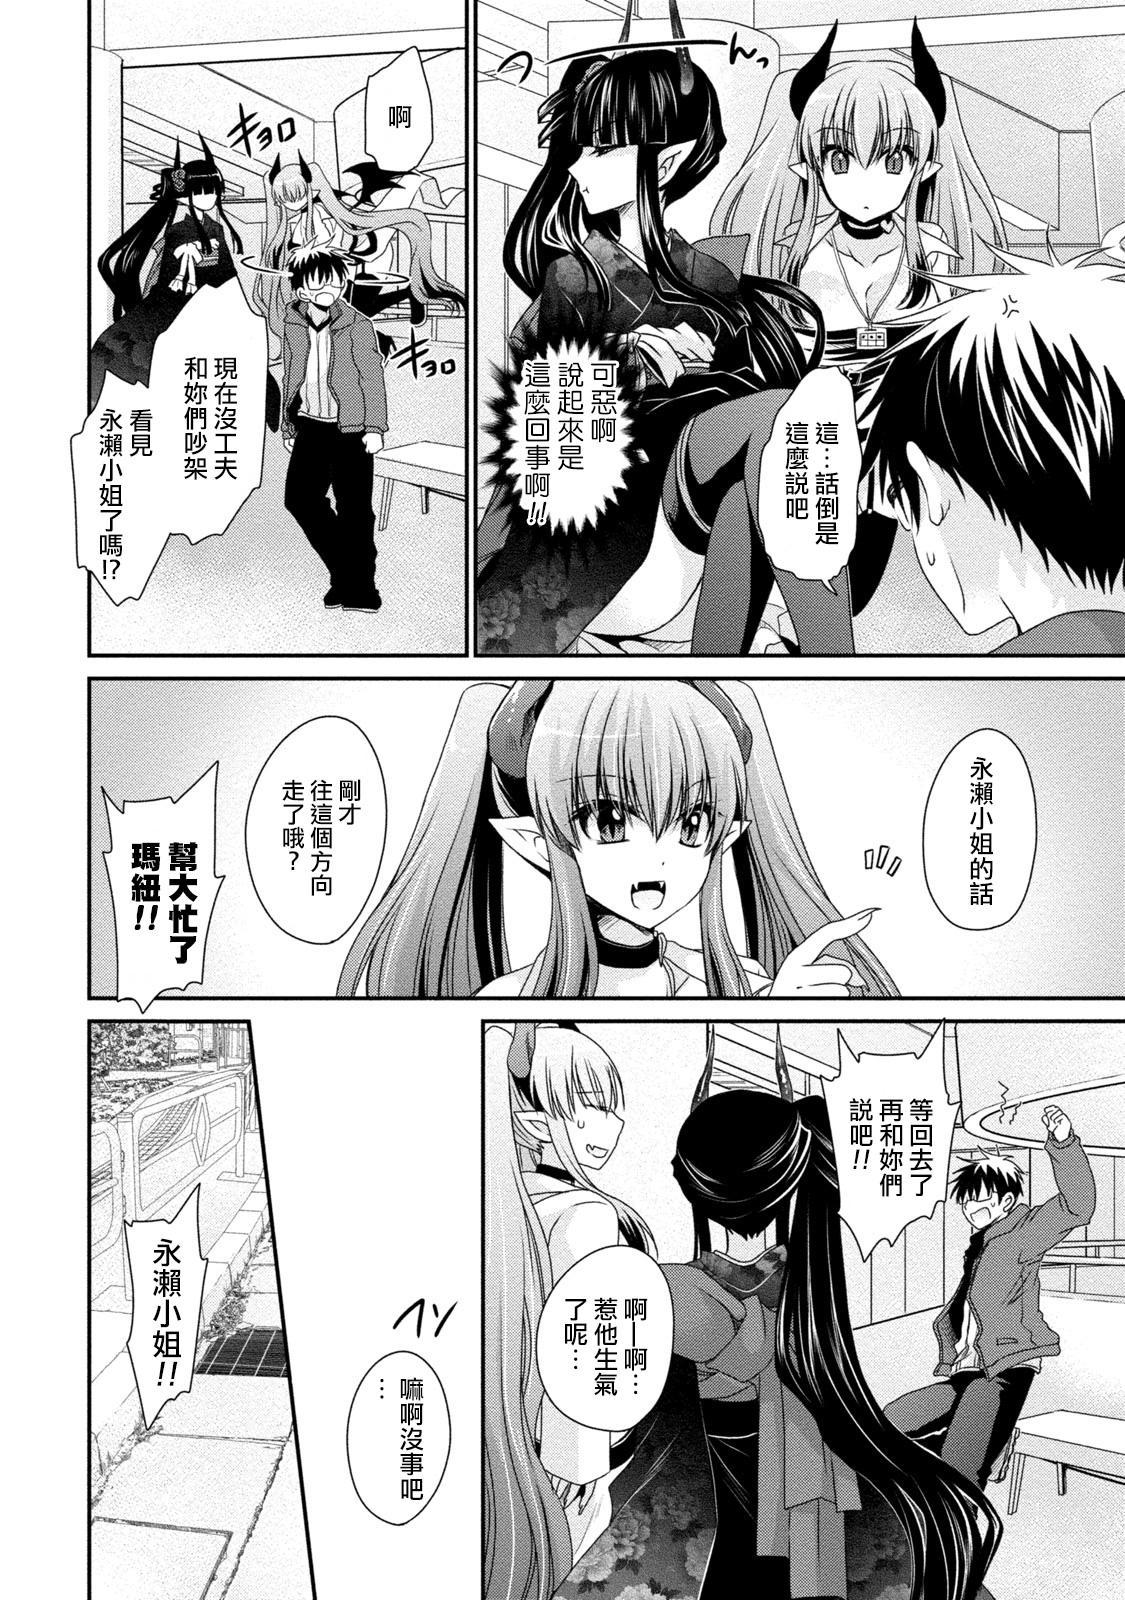 [Shinonome Ryu] Ore to Kanojo to Owaru Sekai - World's end LoveStory ch.10-13 [Chinese] [爱弹幕汉化组] [Digital] 73